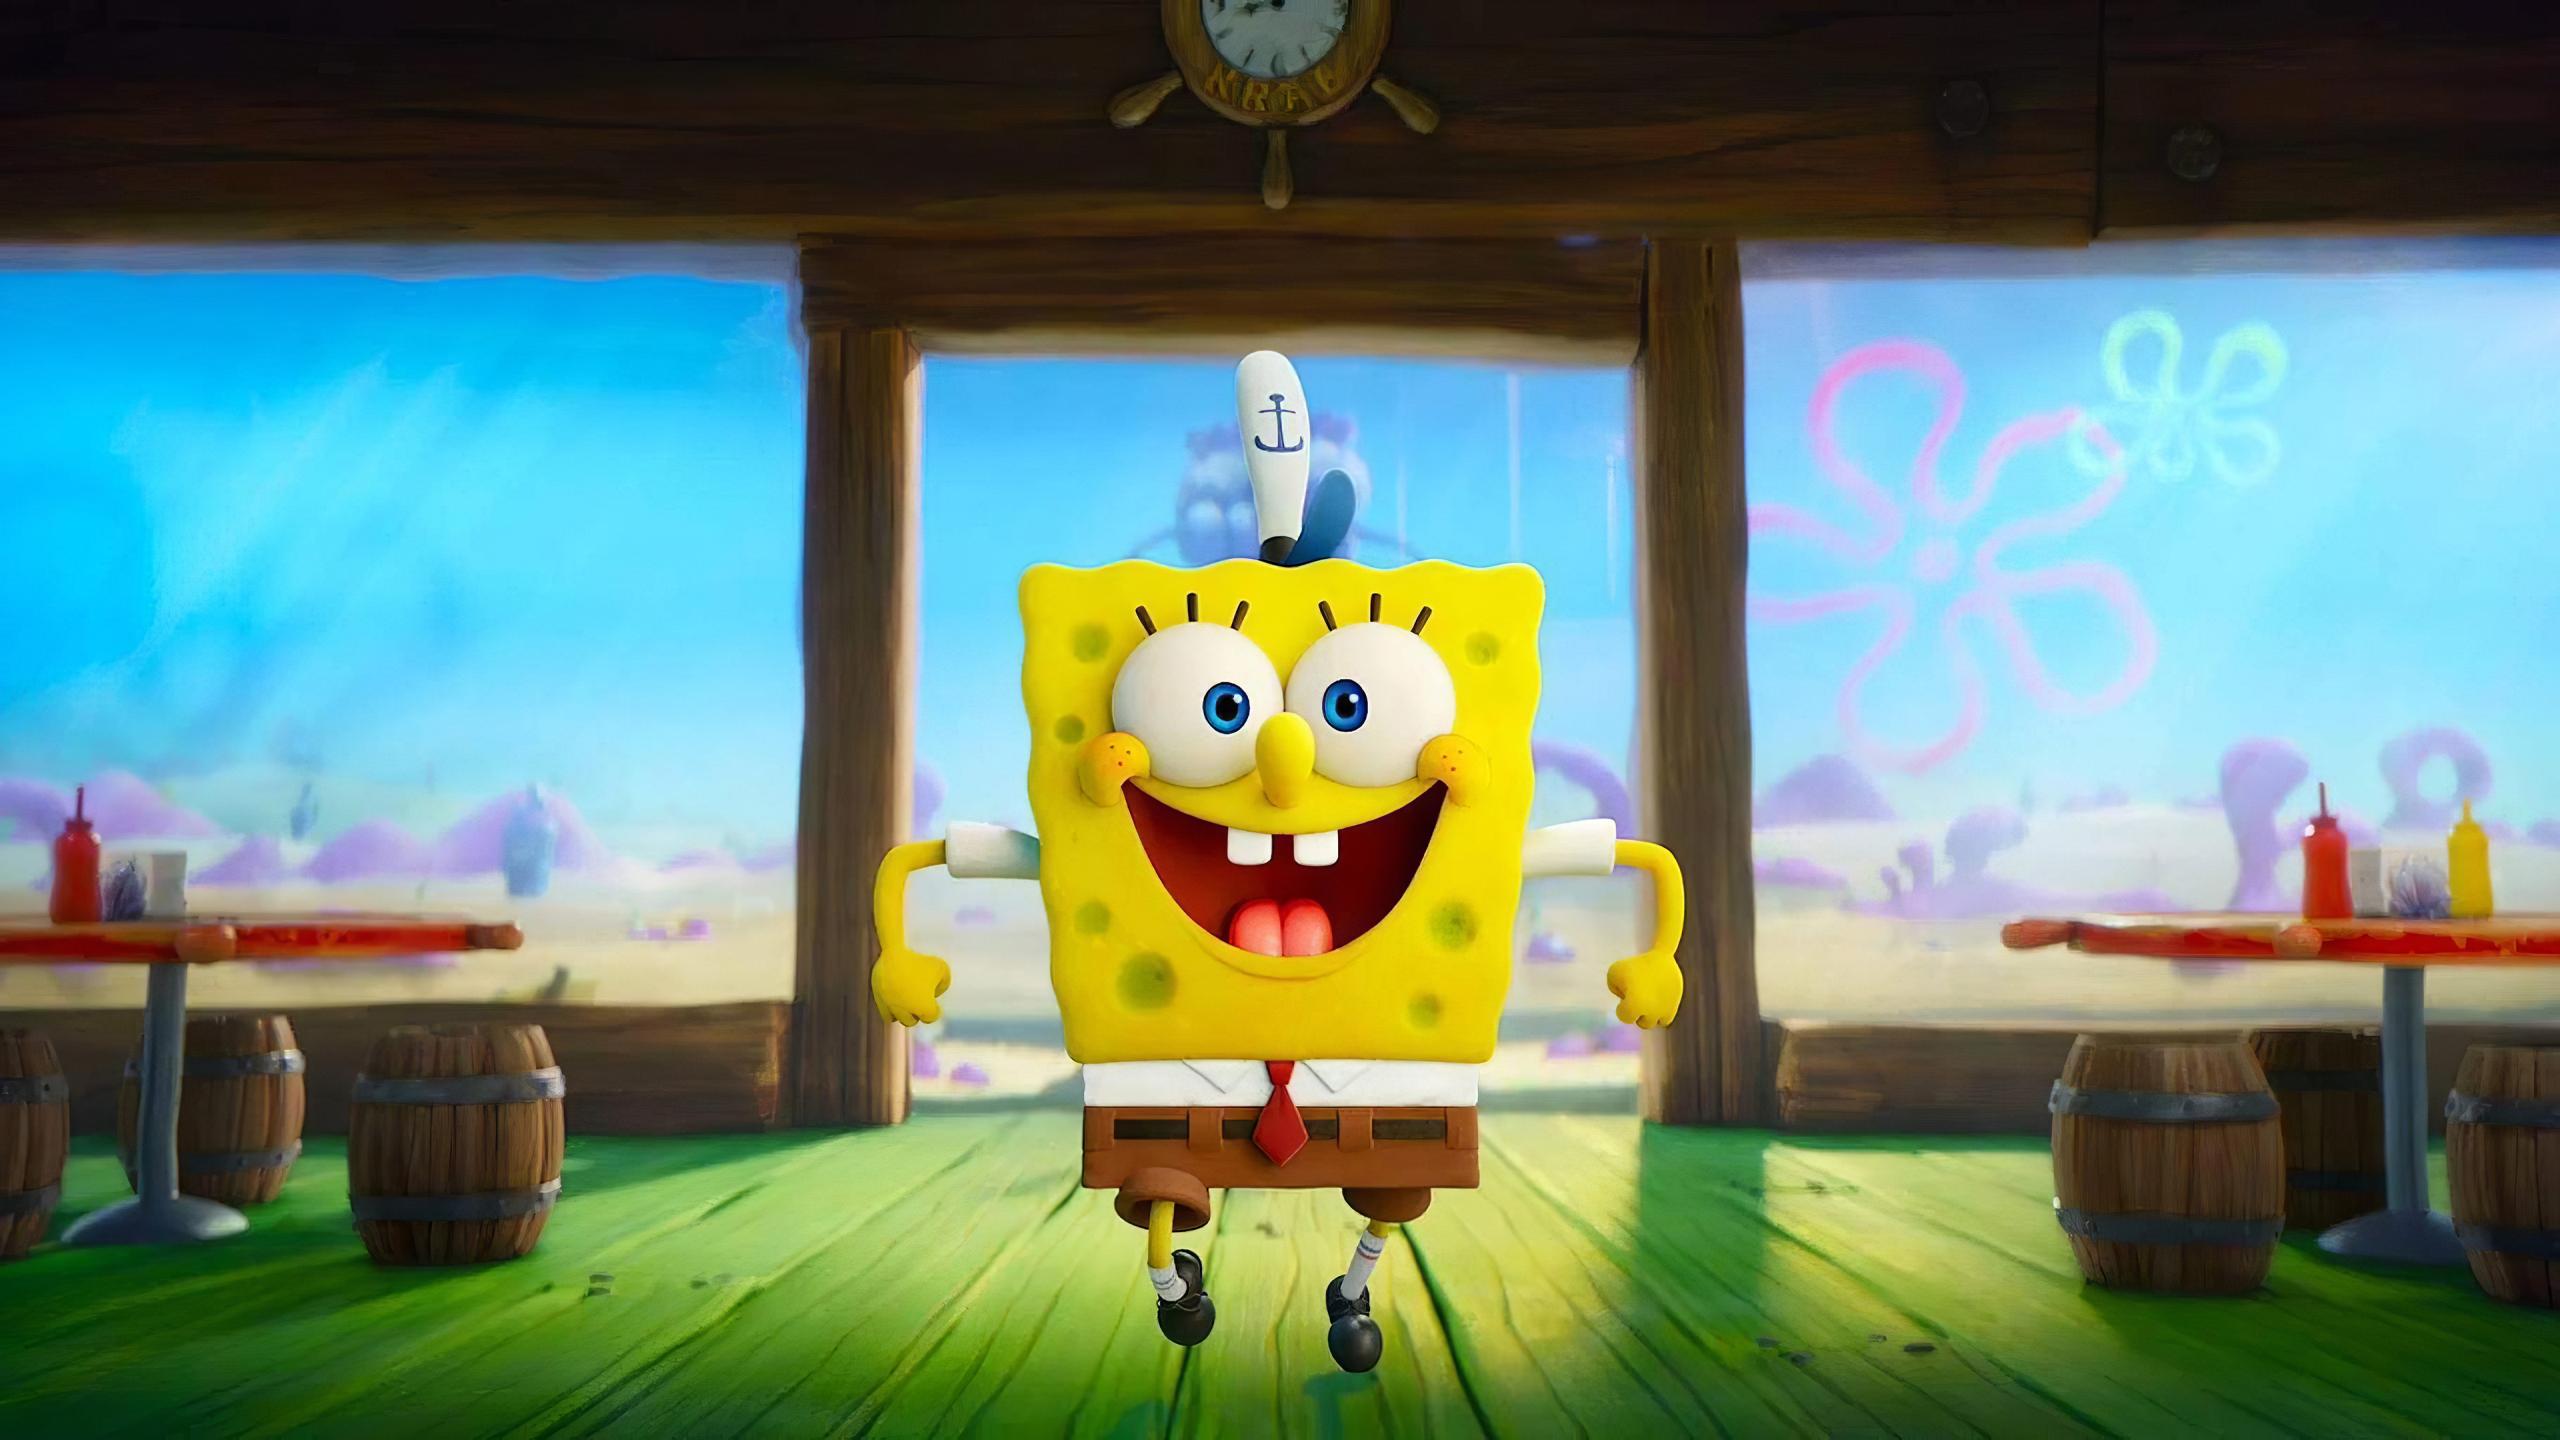 2560x1440 The SpongeBob Movie 4K 1440P Resolution ...